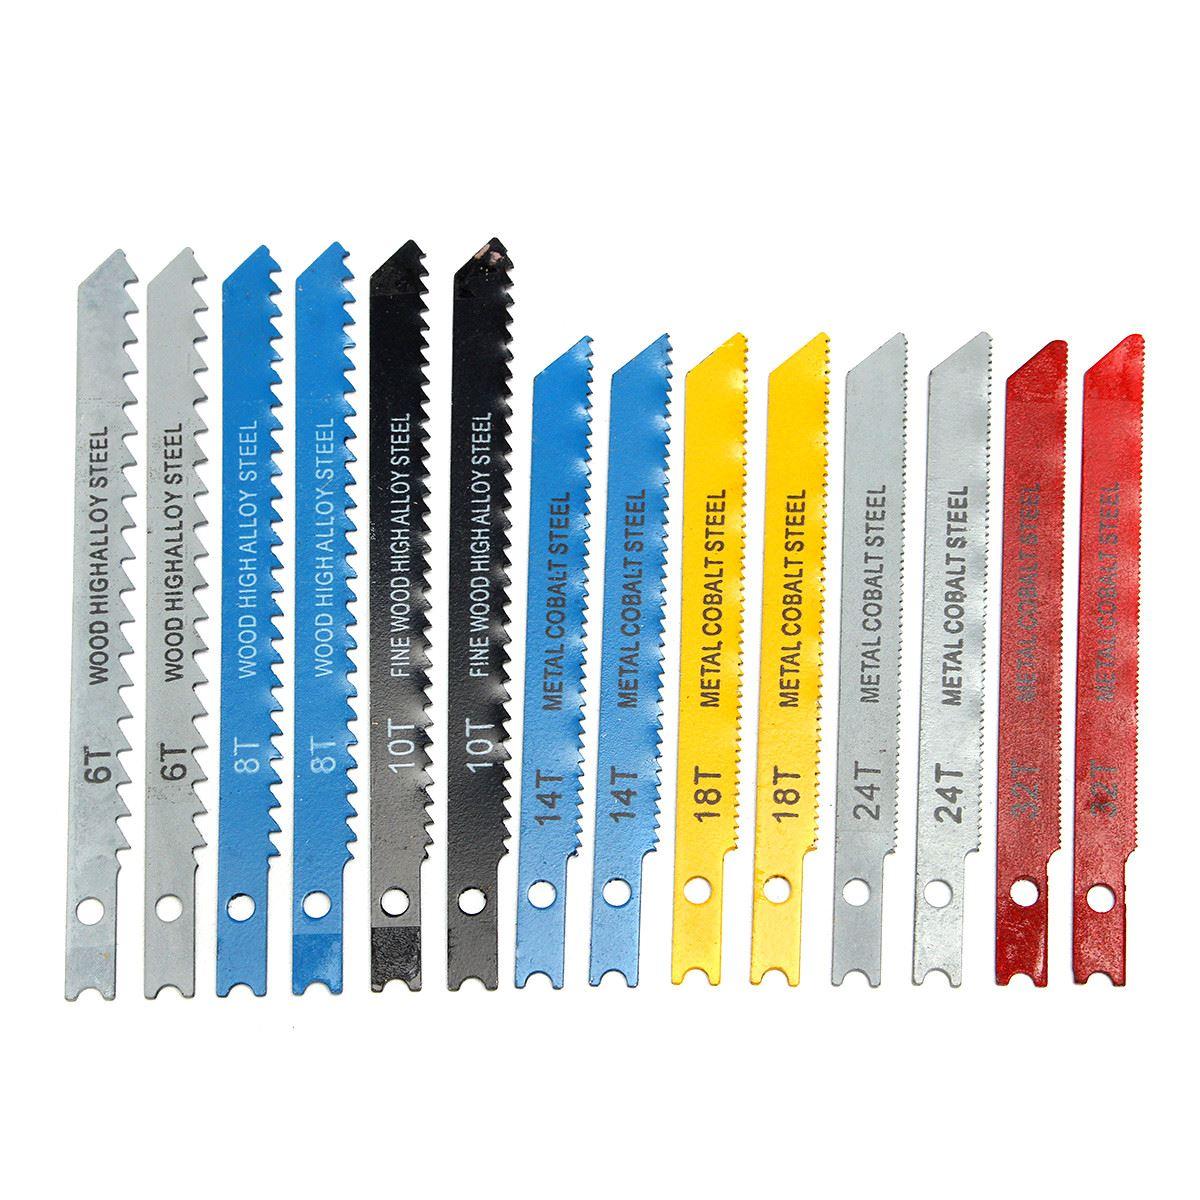 14pcs U Fitting Jigsaw Blades Set Metal Plastic Wood Jig Saw Tool Wholesale Price